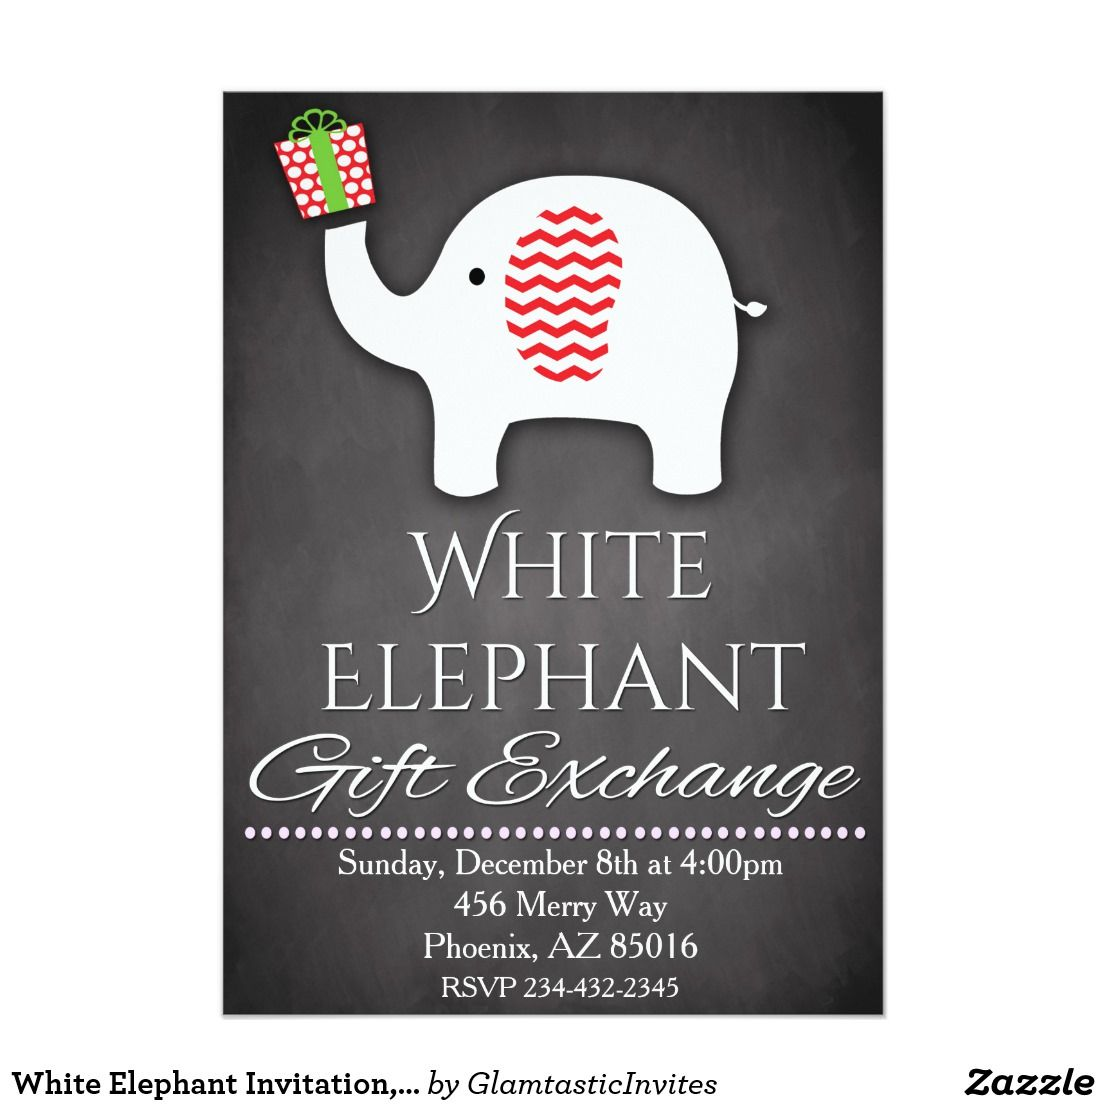 White Elephant Invitation, Gift Exchange Invite   White elephant ...